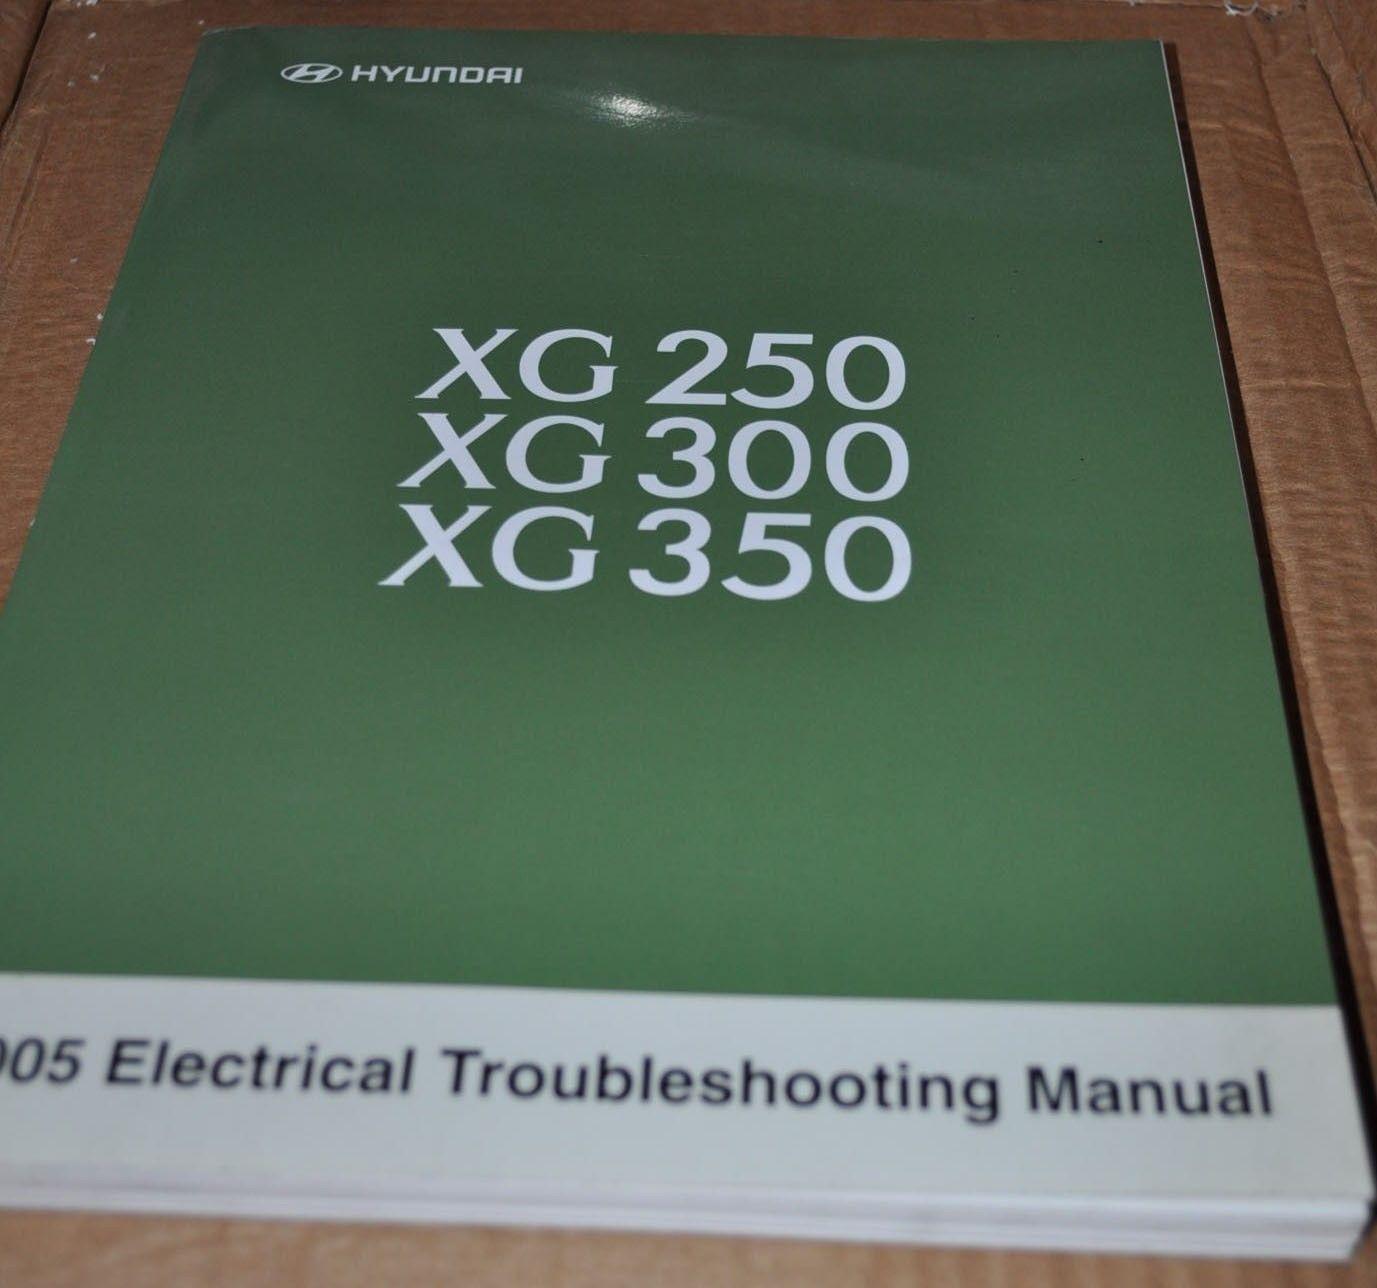 Hyundai XG250 XG300 XG350 2005 Electrical Troubleshooting Manual Original  Book - AUTO BROCHURE